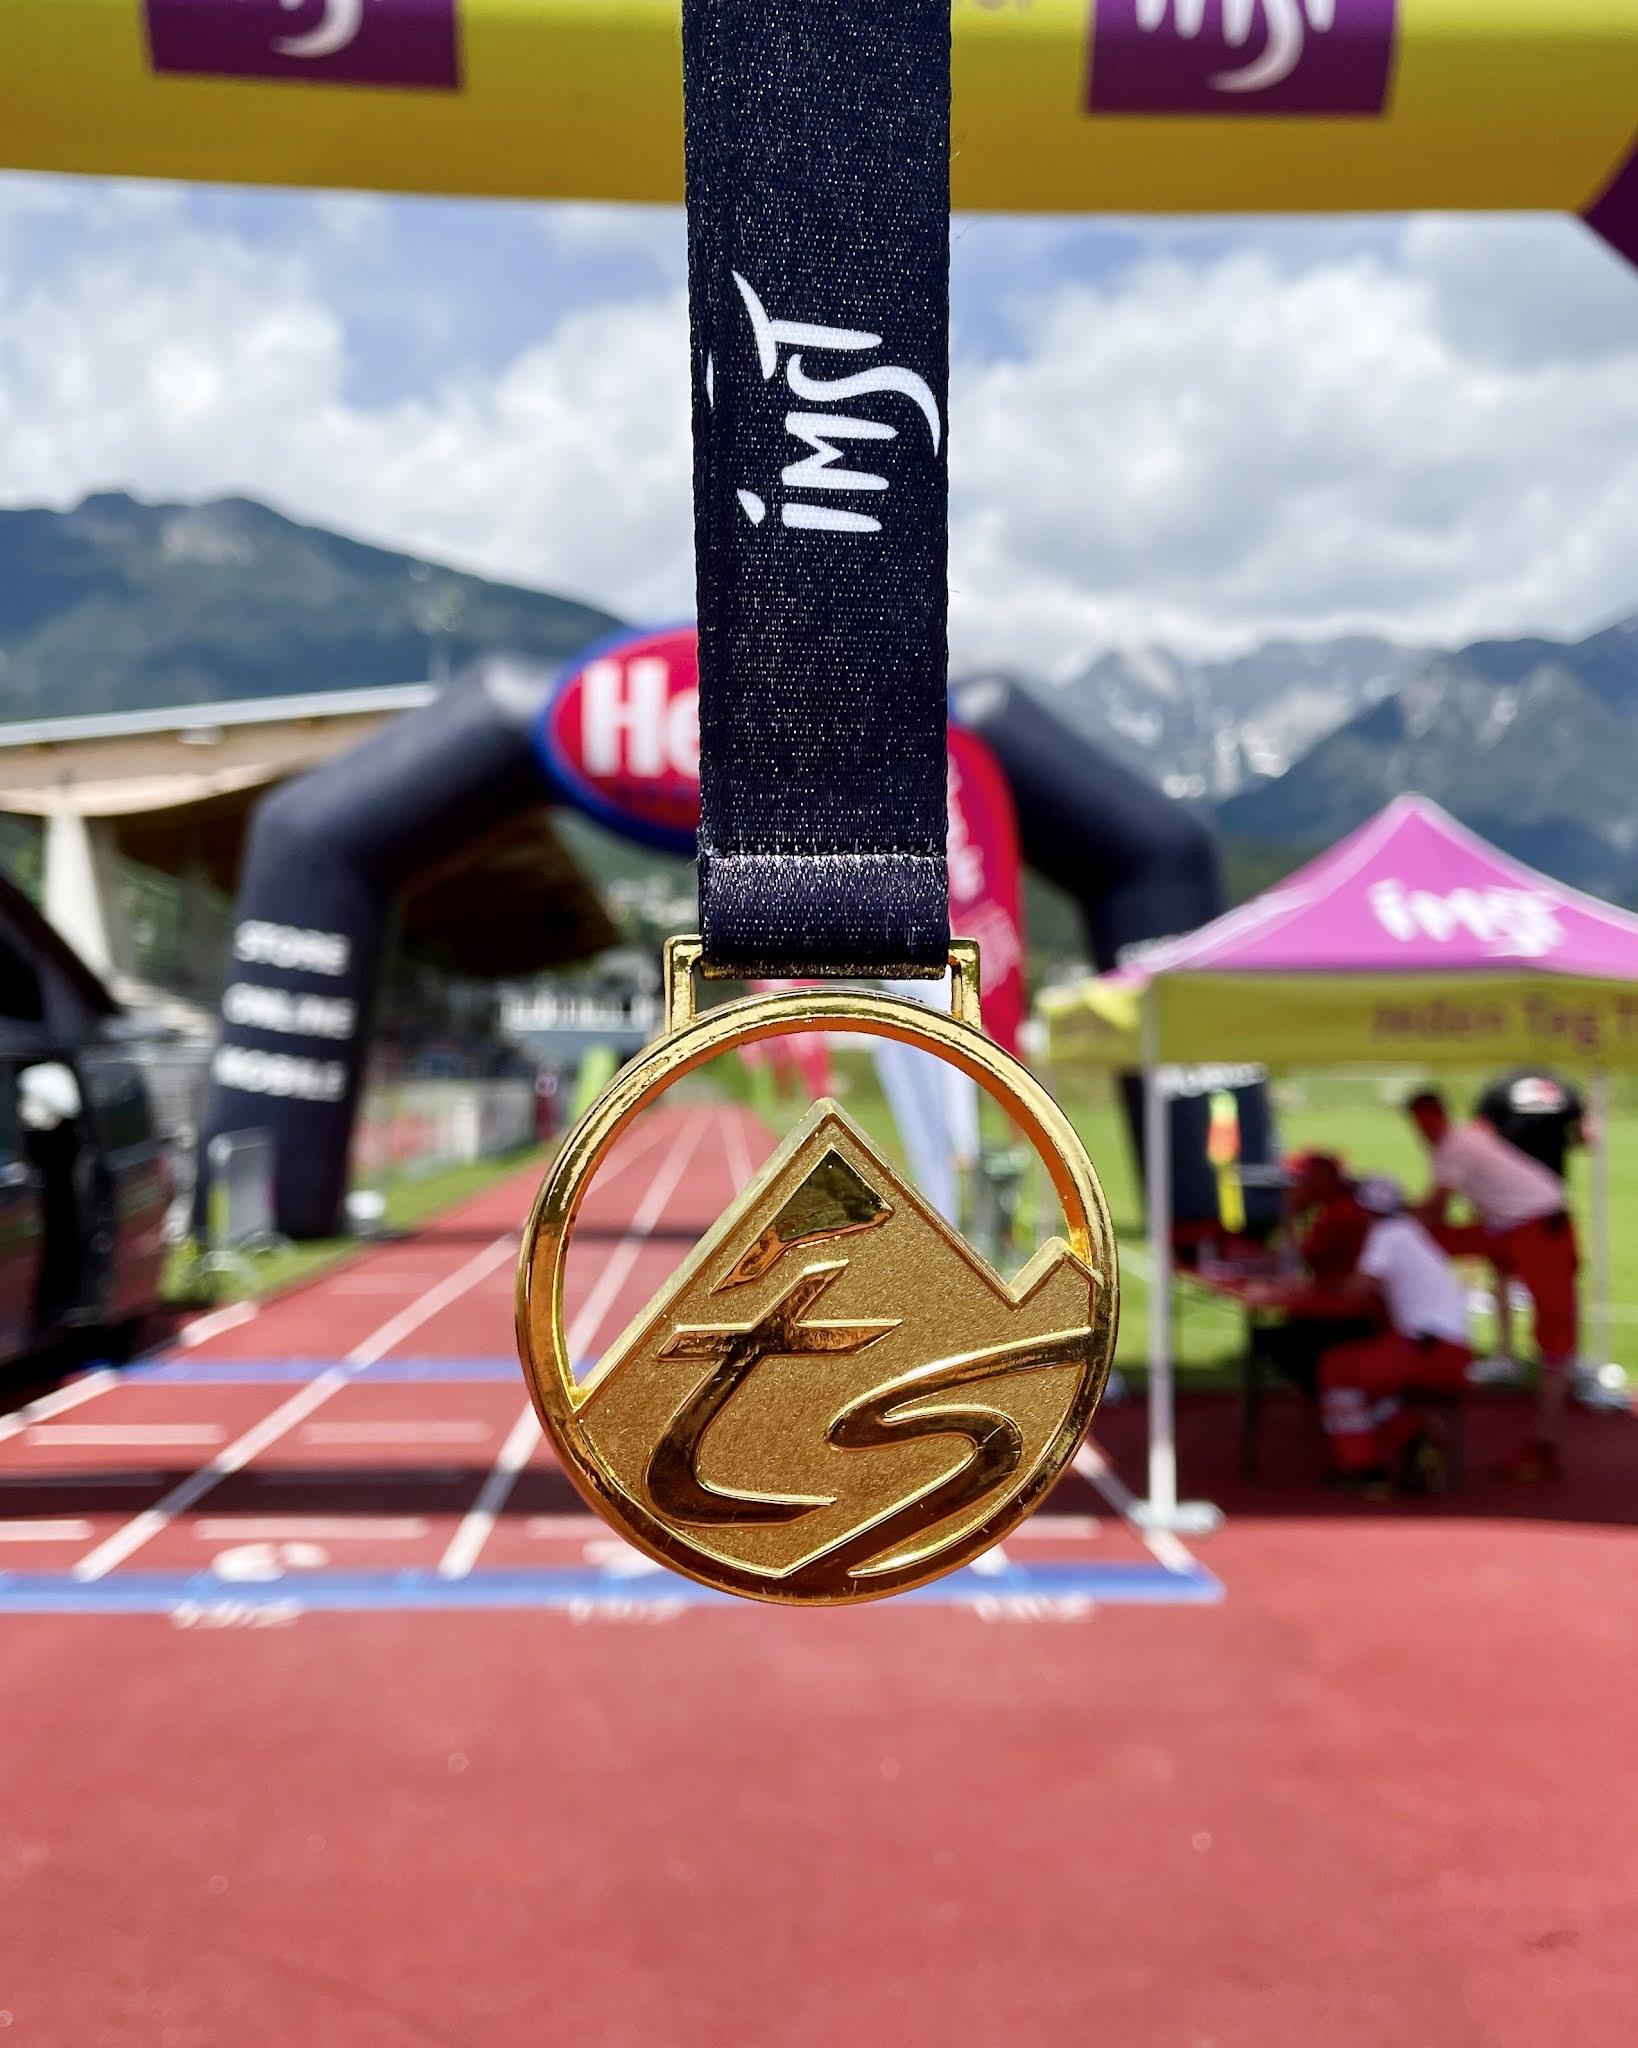 Tschirgant Sky Run Medal Medaille